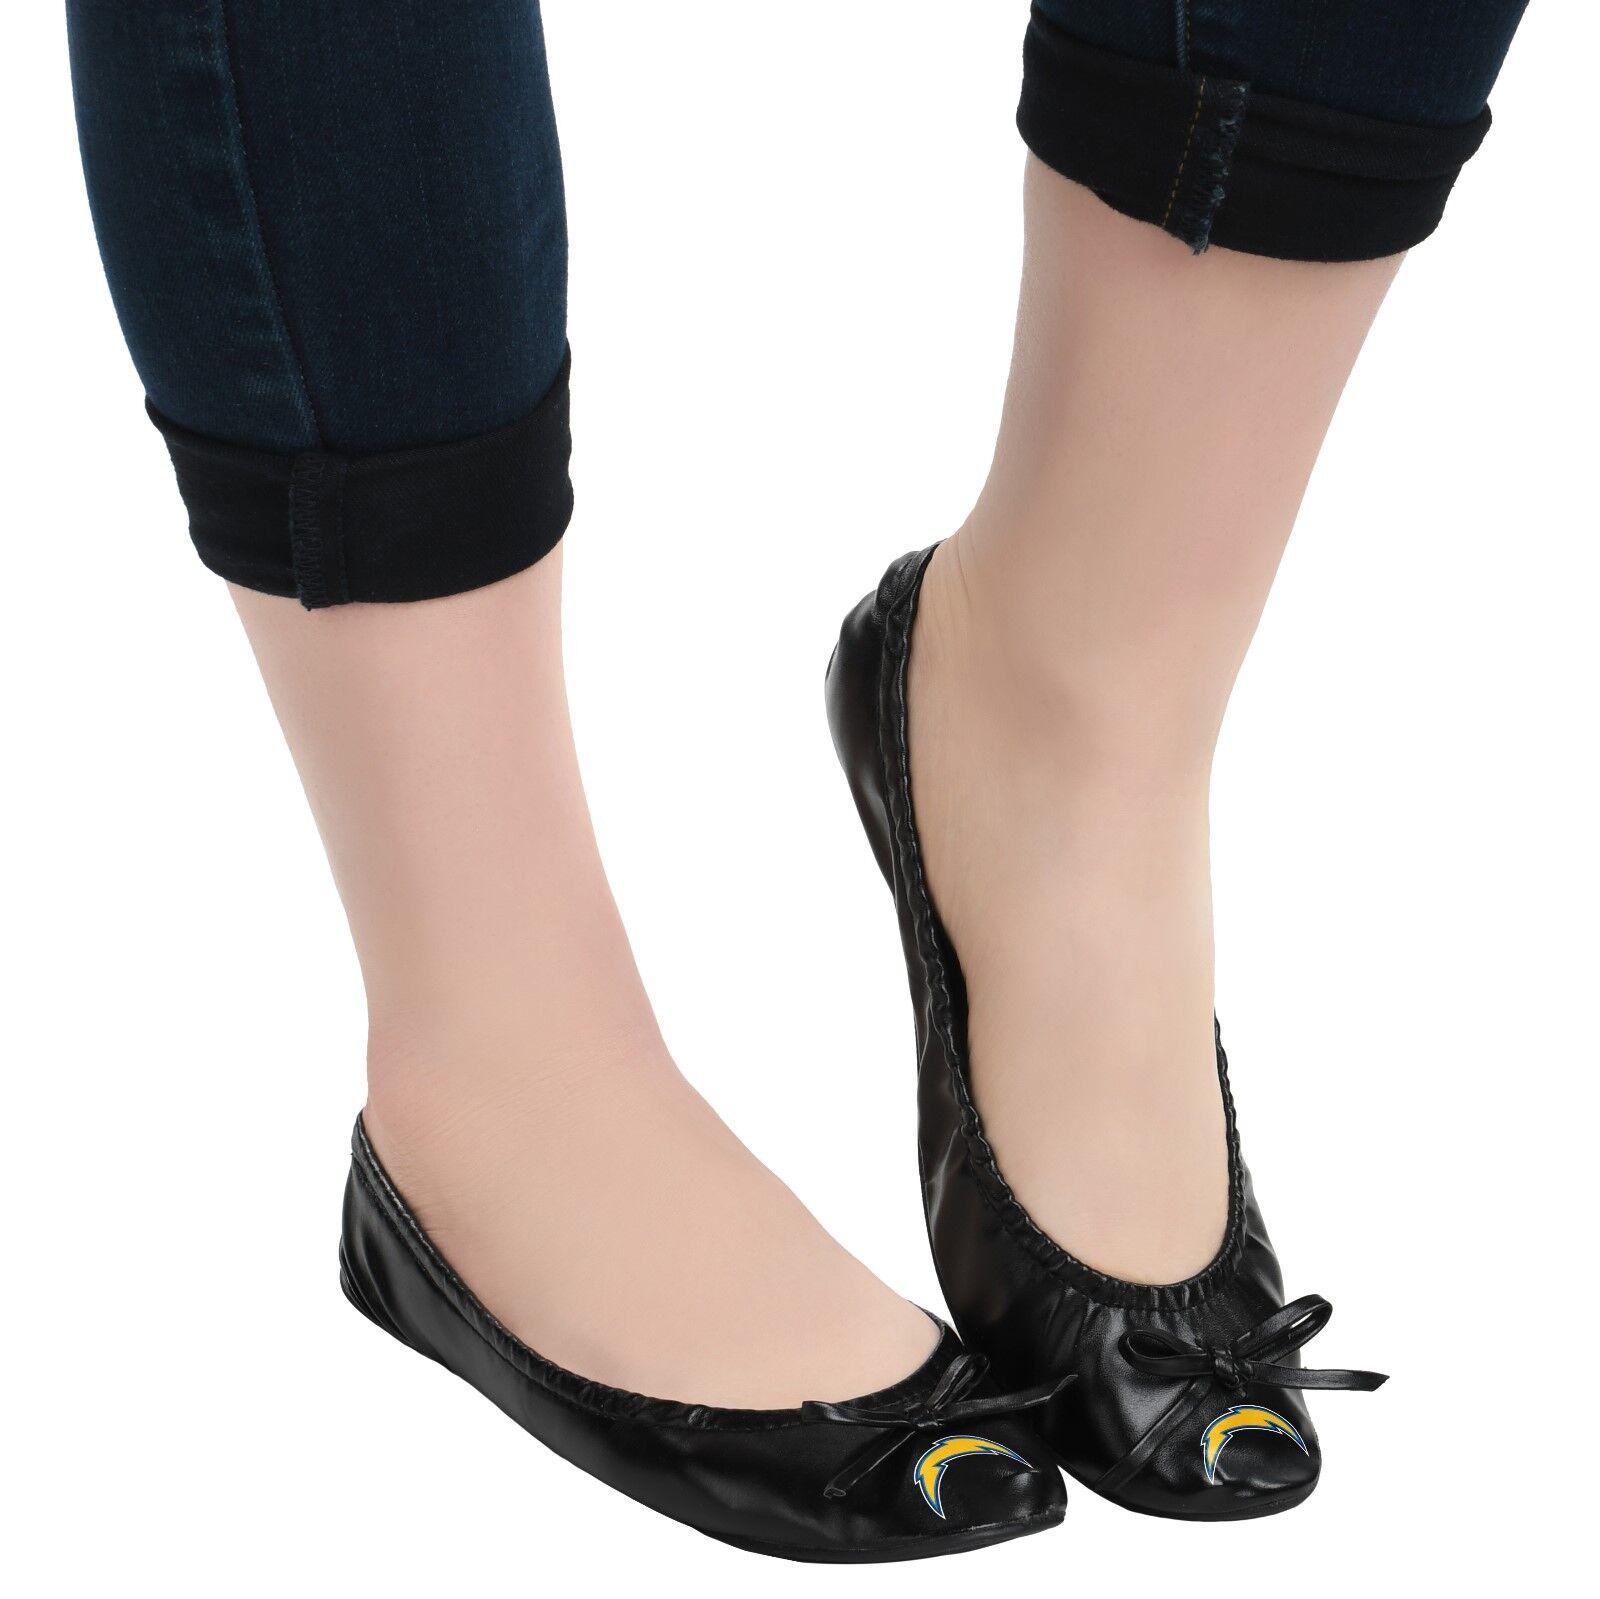 NFL Football Team Logo Womens Black Foldable Slip On Flats Shoes w/ Clutch Bag